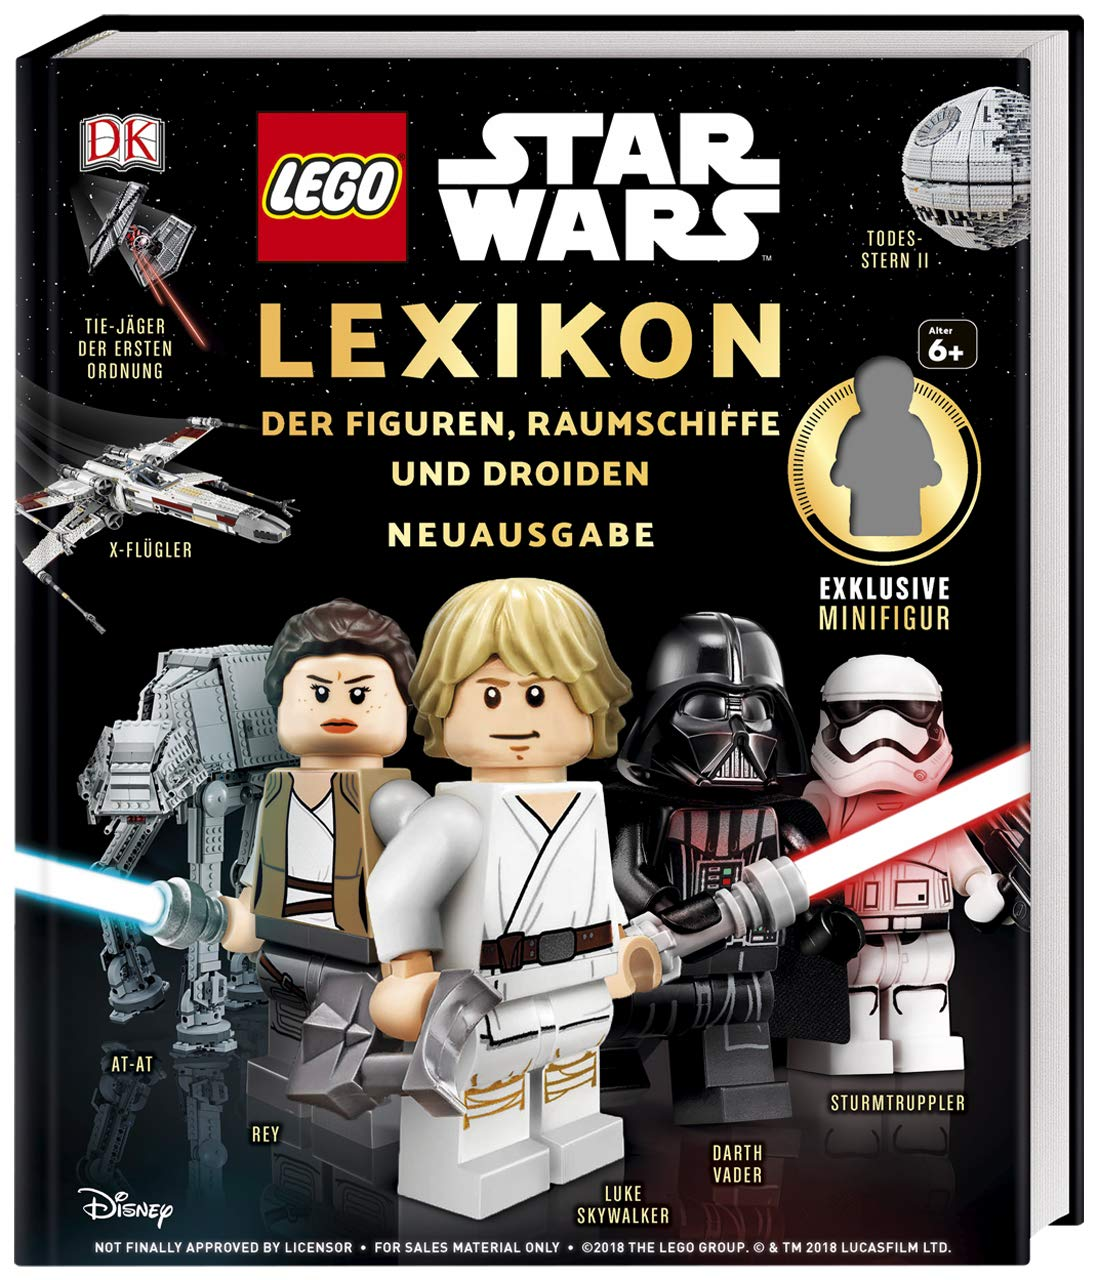 LEGO Star Wars Lexikon 2019